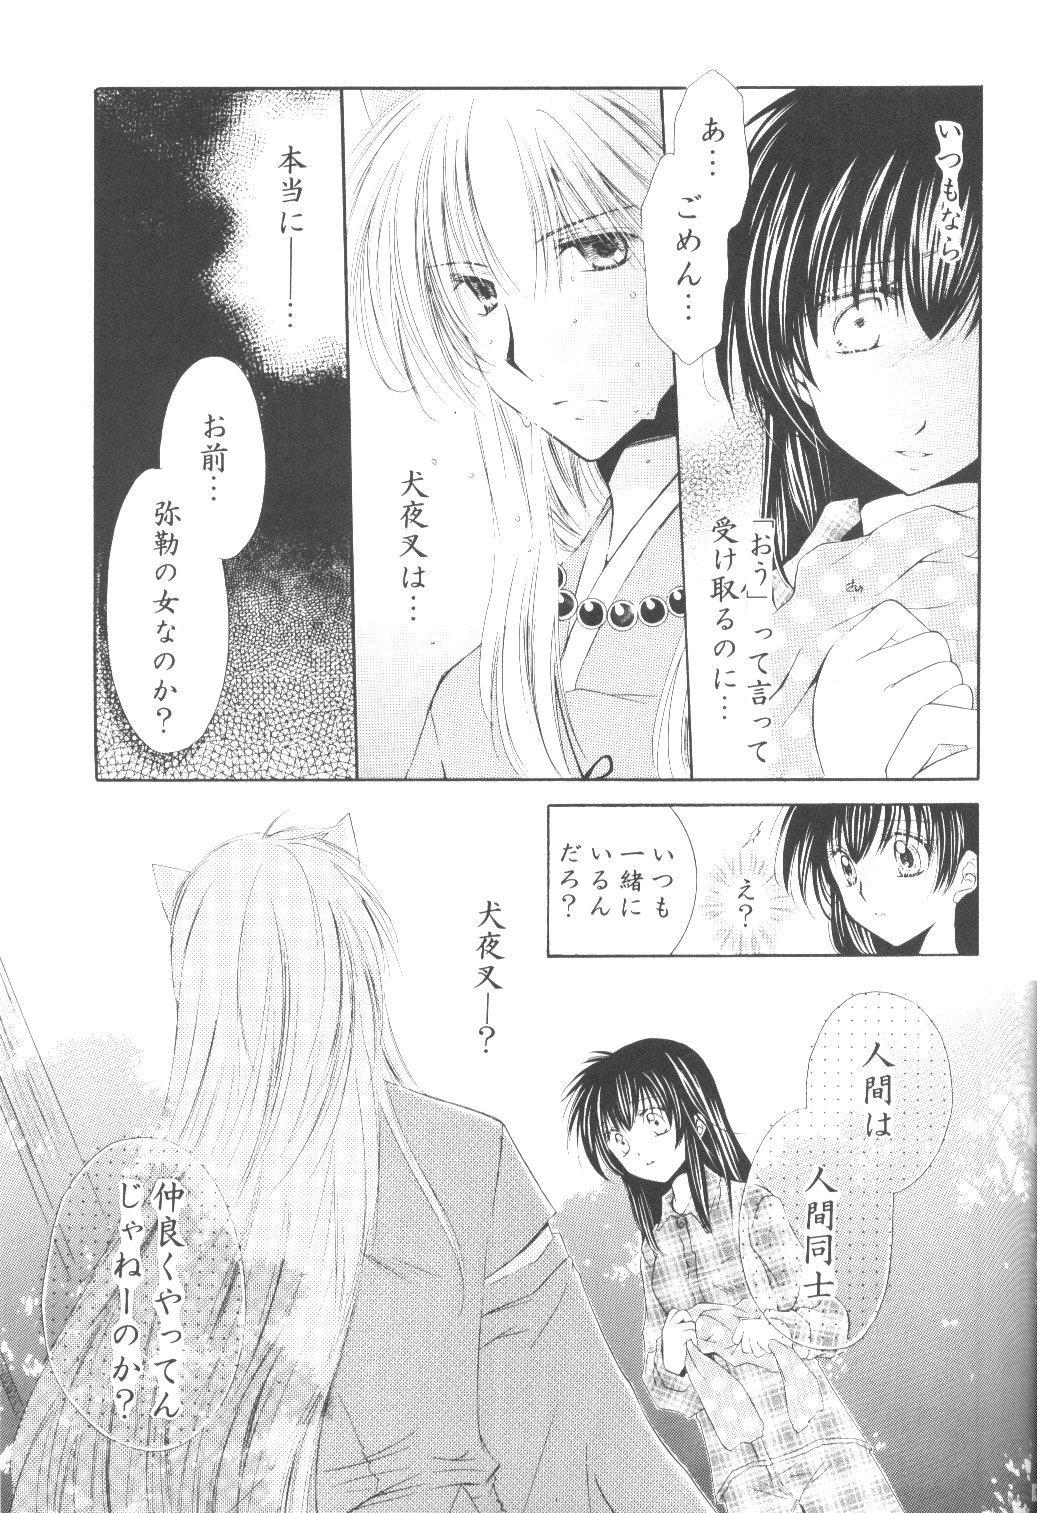 Ryuusei Ryodan 14